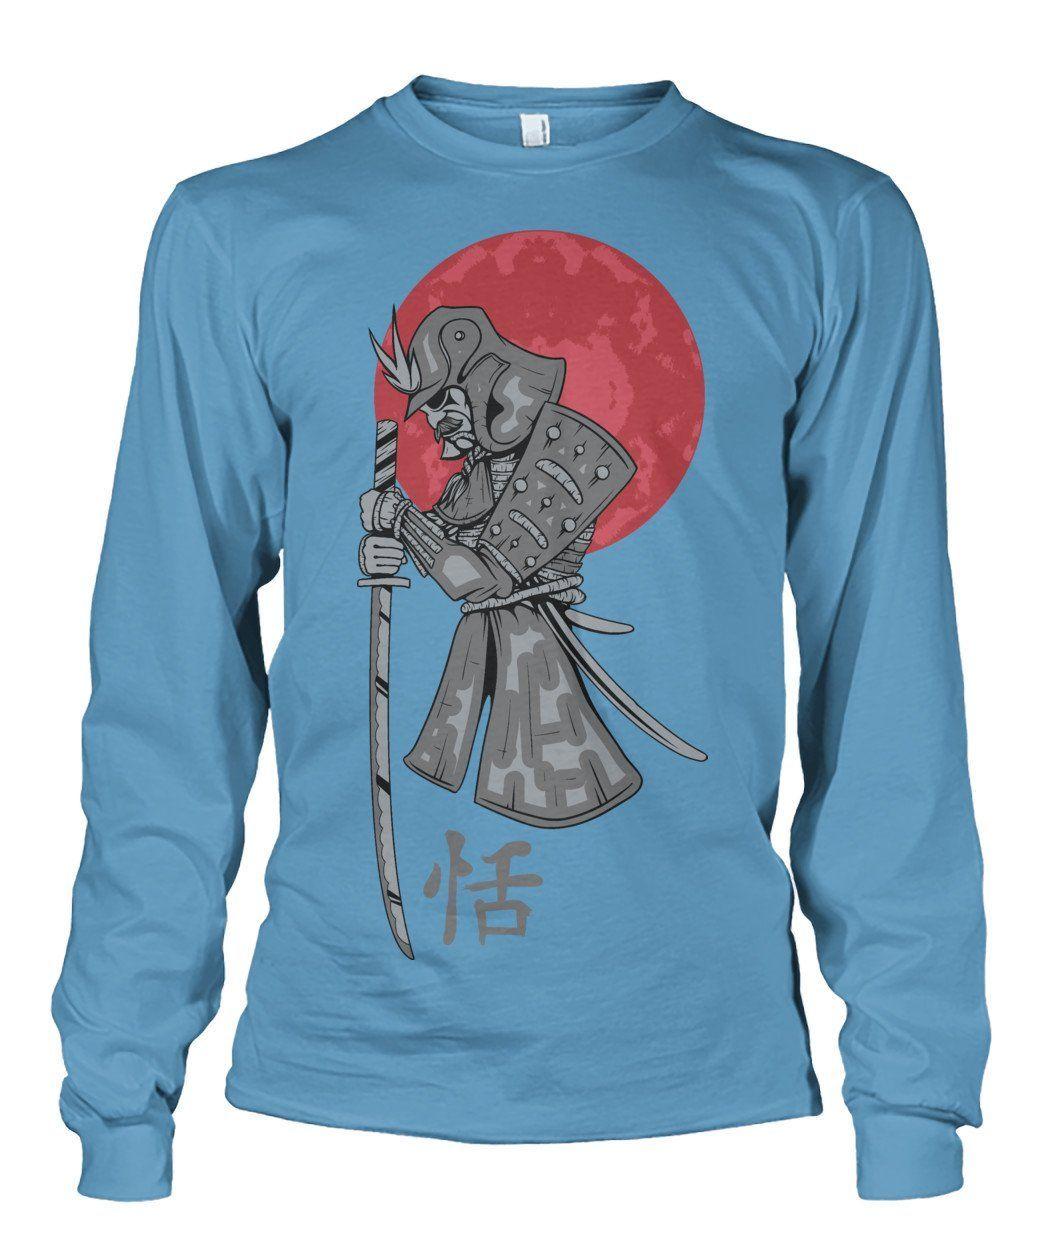 Samurai Sword Pledge